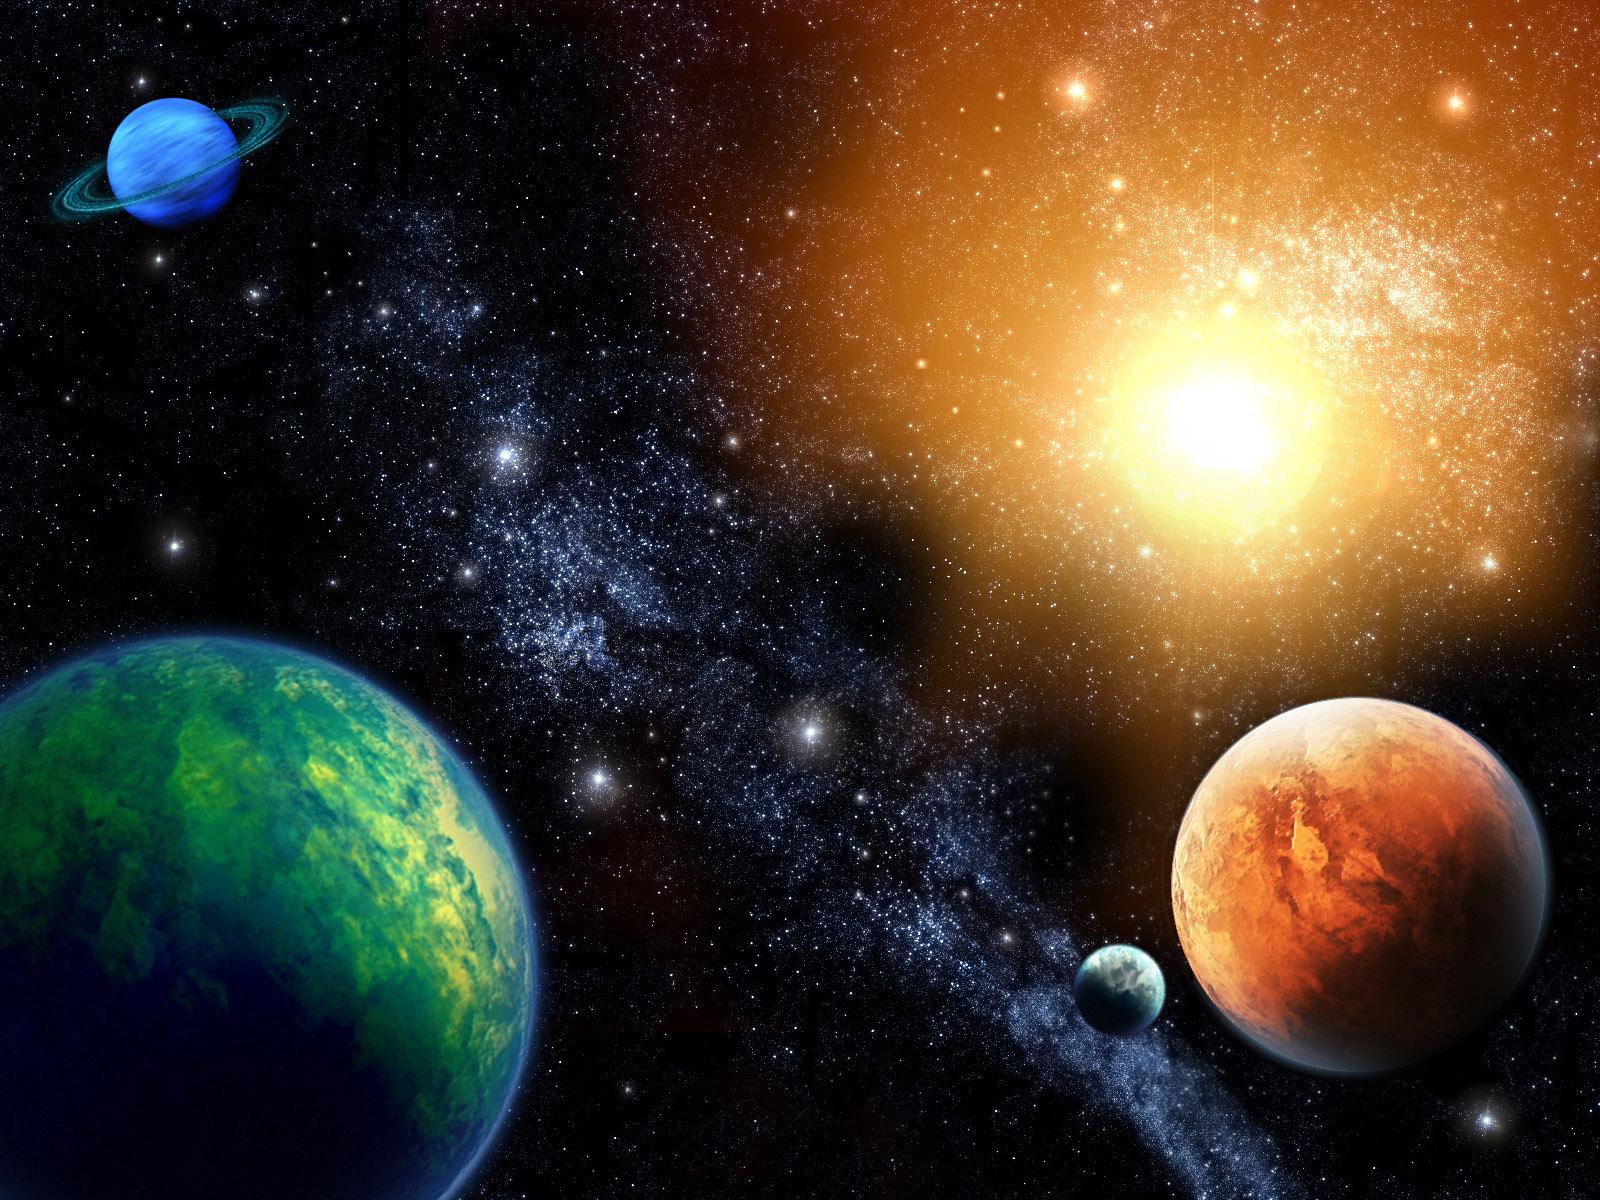 http://3.bp.blogspot.com/_3yq24CtI35M/TJuN1hTDaBI/AAAAAAAAA7E/OSF8i42fxn0/s1600/digital-universe-1441.jpg